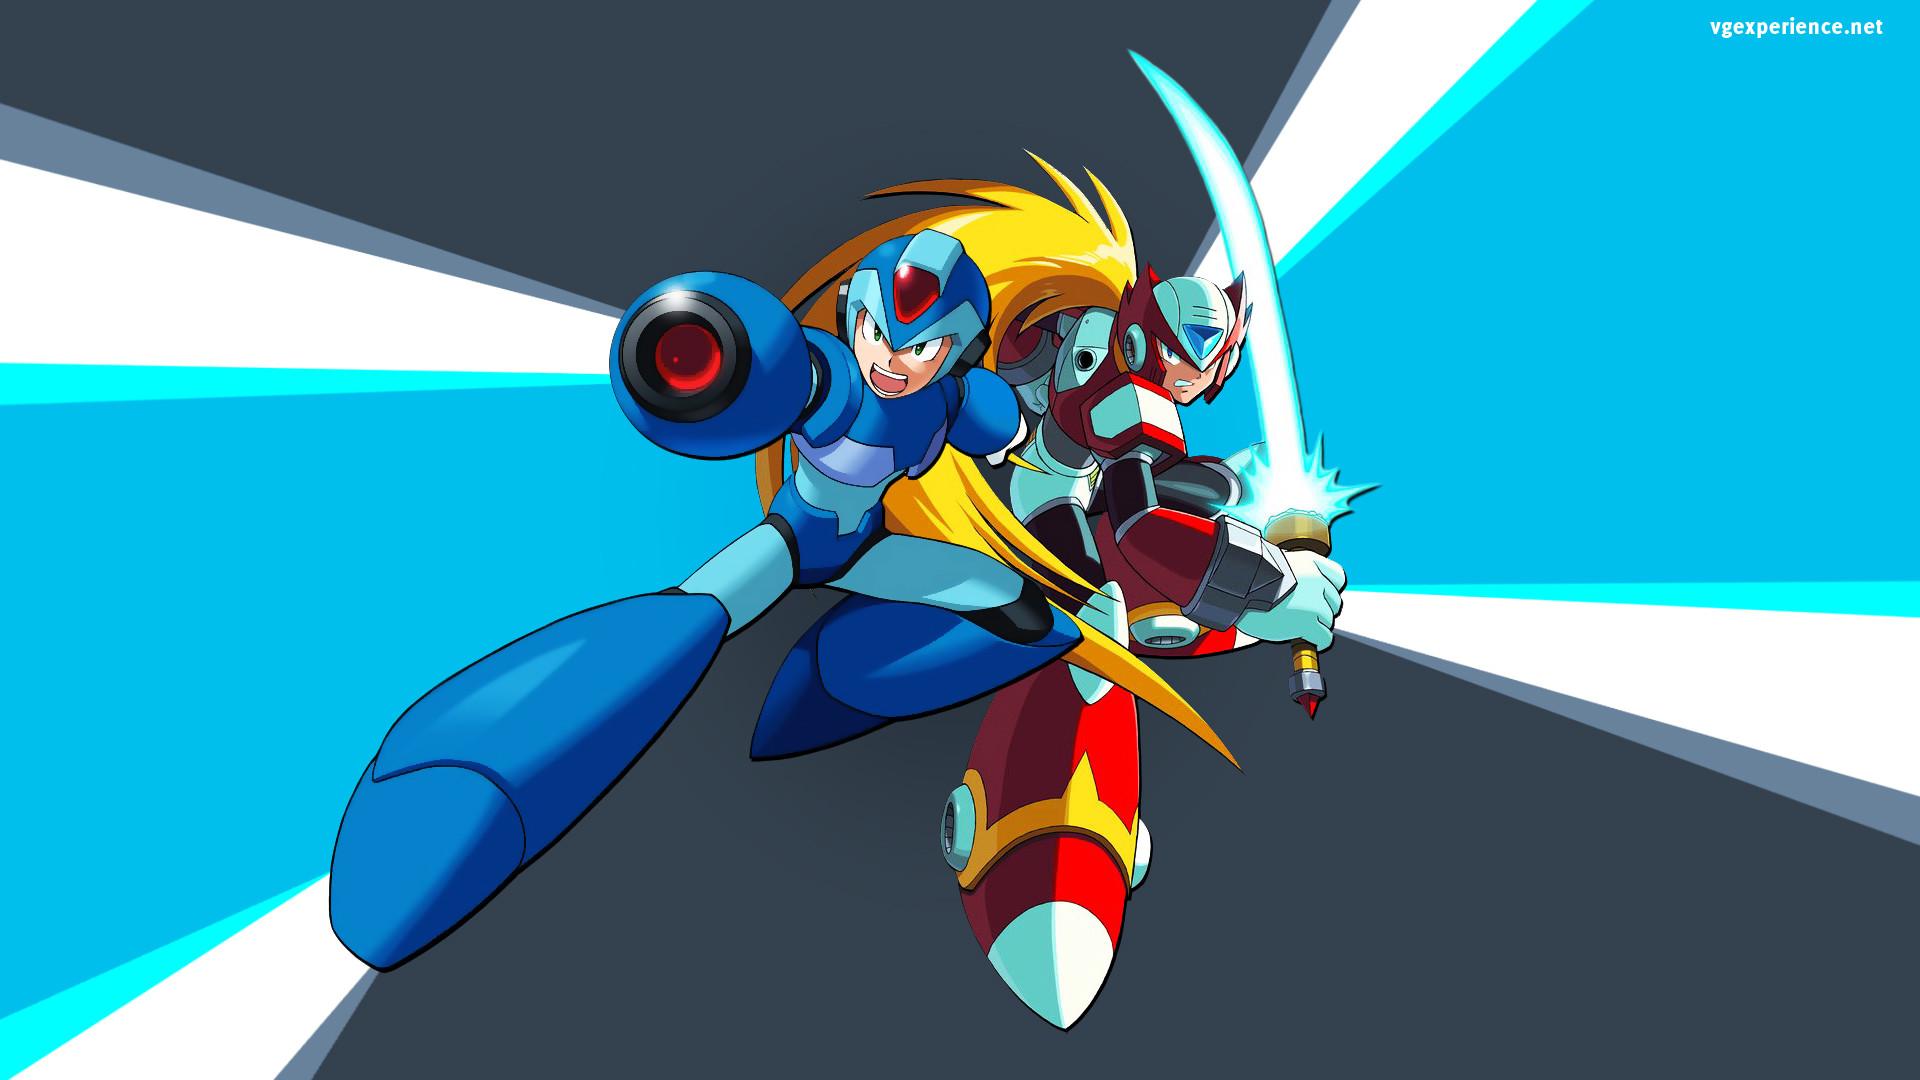 Megaman y Zero wallpaper – ForWallpaper.com